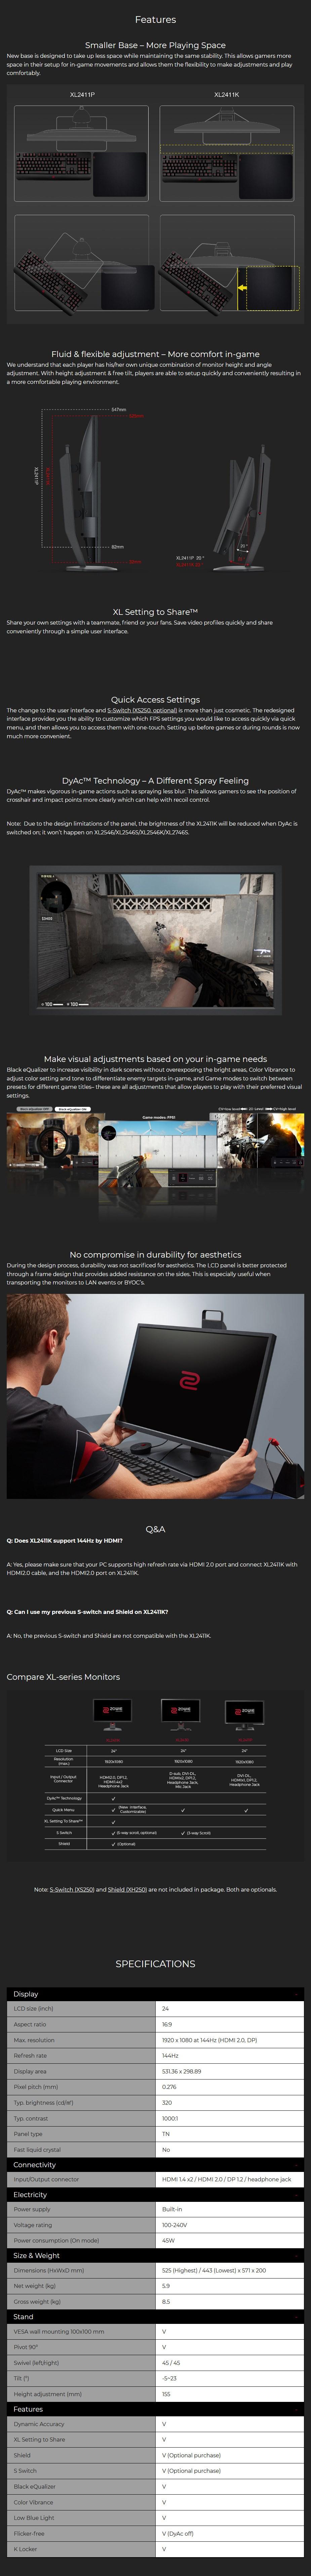 "BenQ ZOWIE XL2411K 24"" 144Hz Full HD DyAc TN Gaming Monitor - Overview 1"